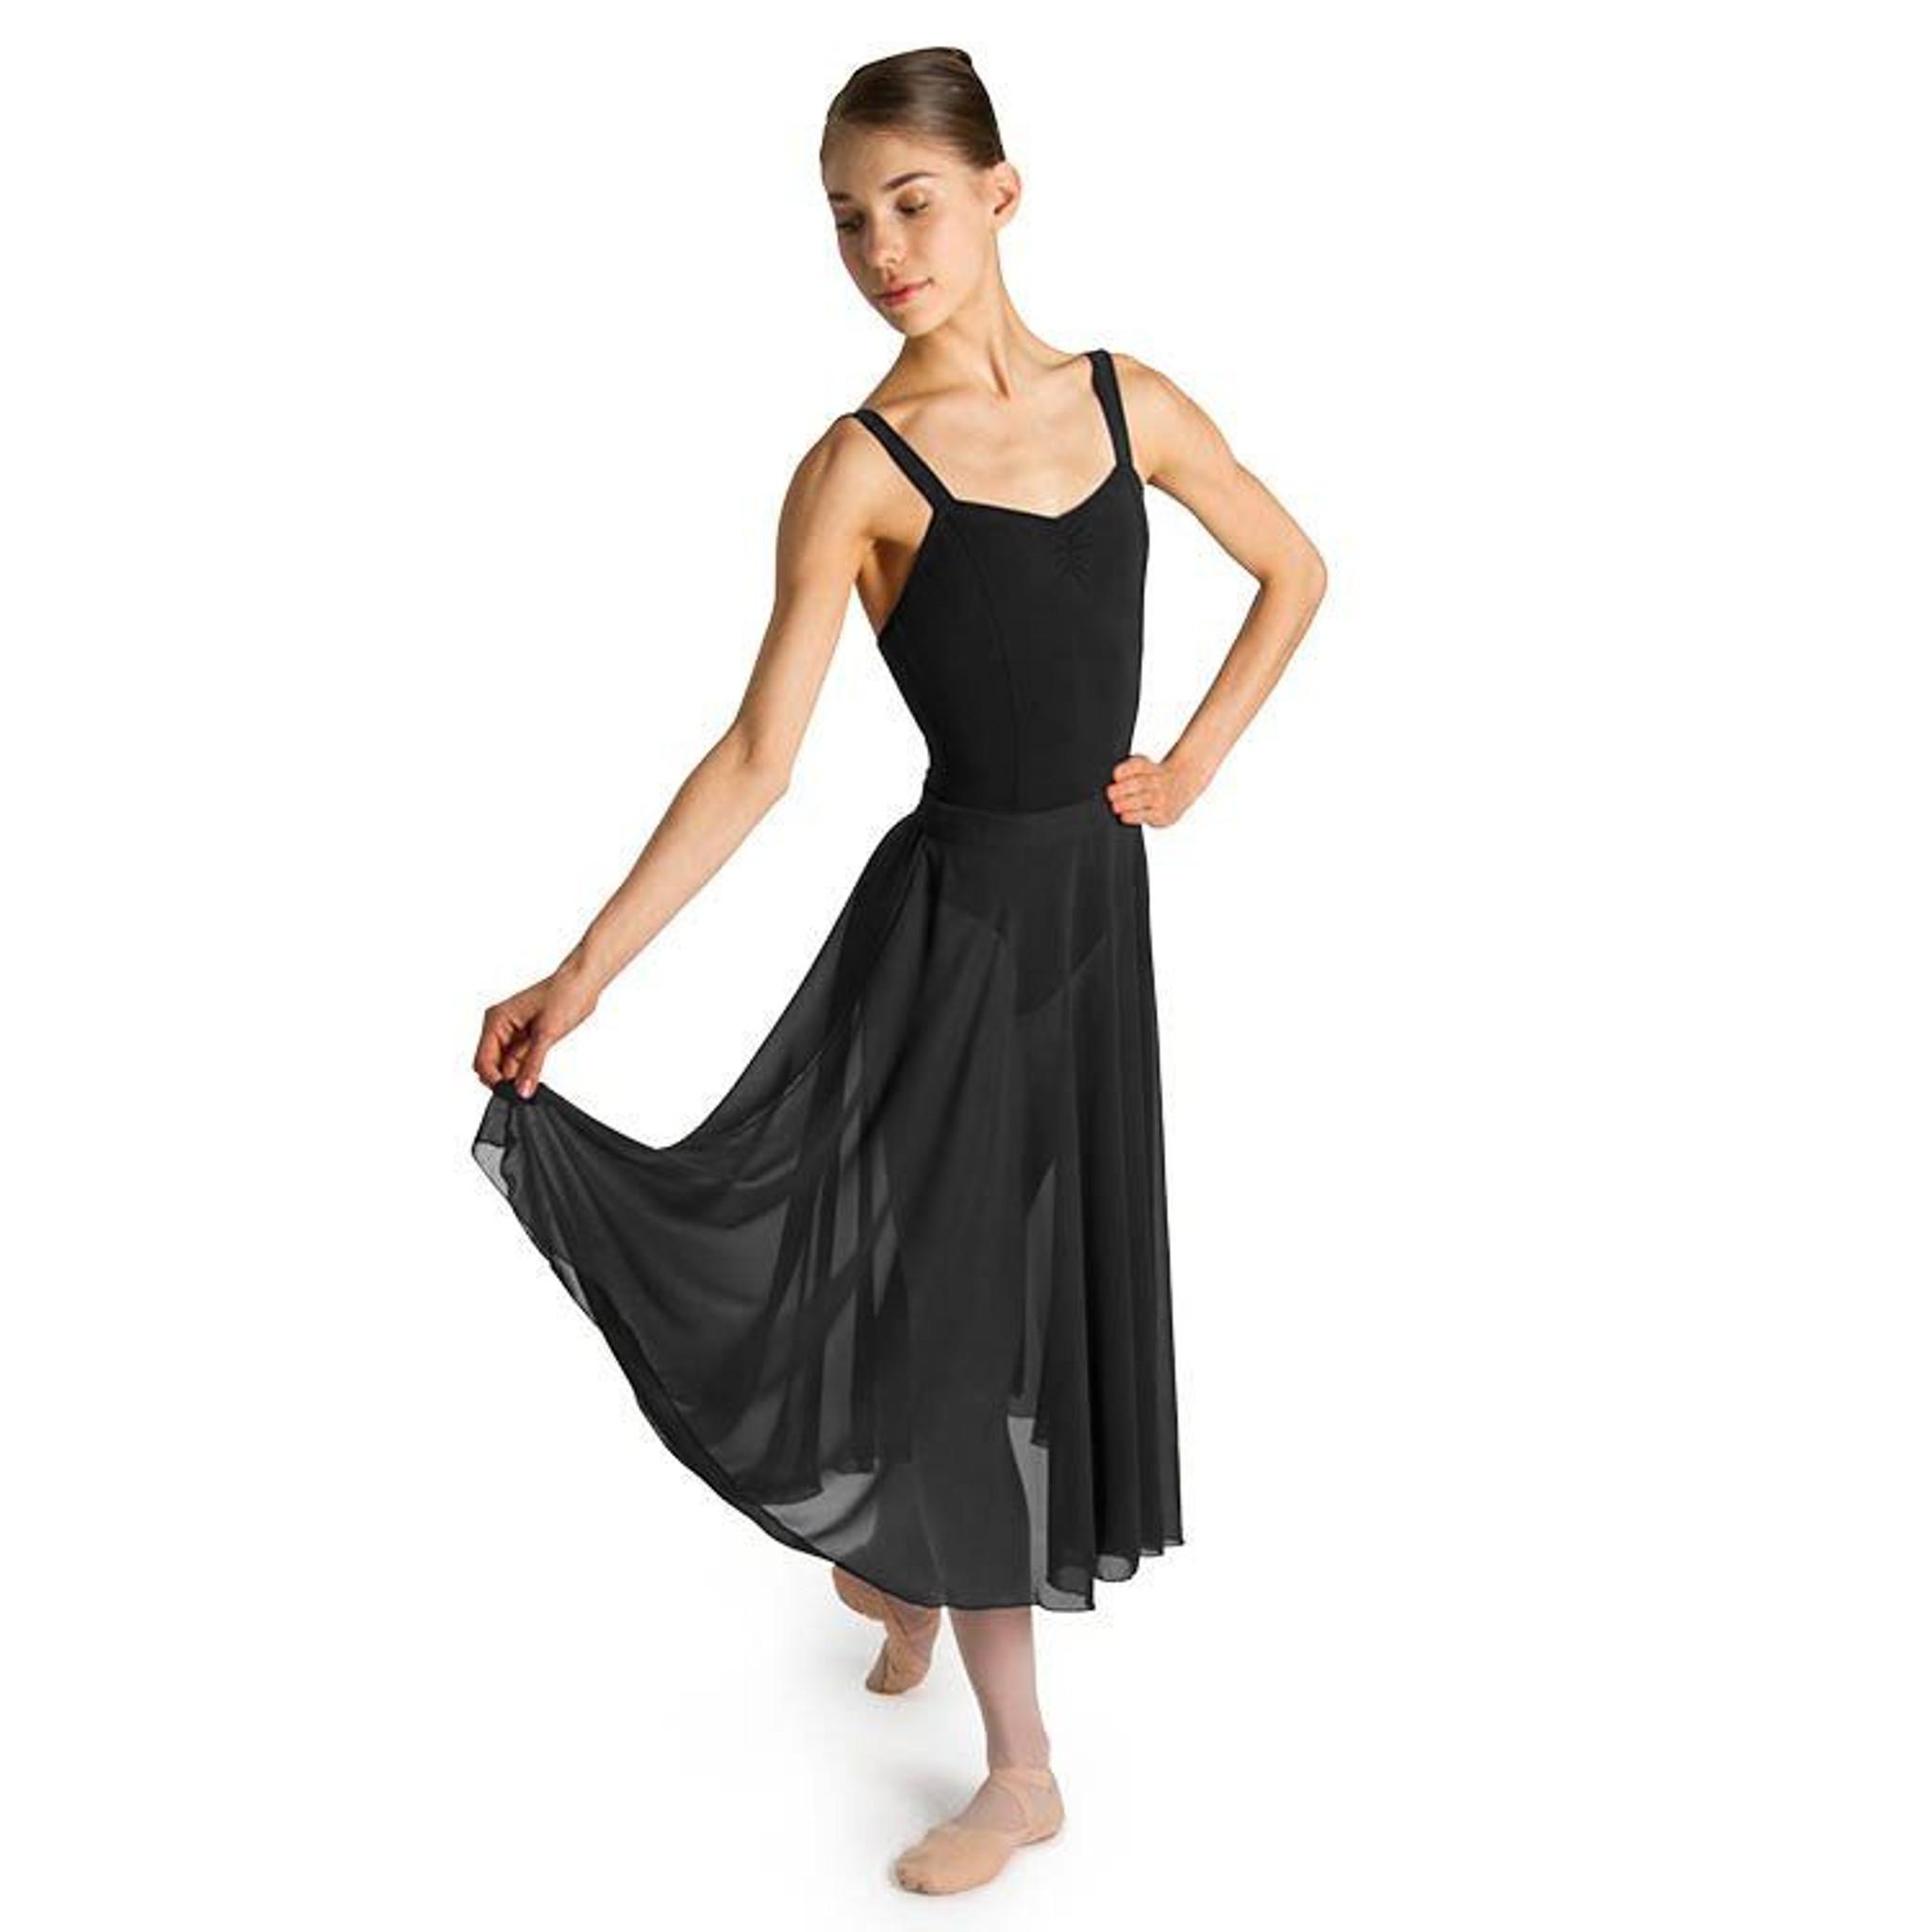 65d5081c8 Bloch Charlyn Full Circle Chiffon Women's Skirt - DANCE DIRECT®